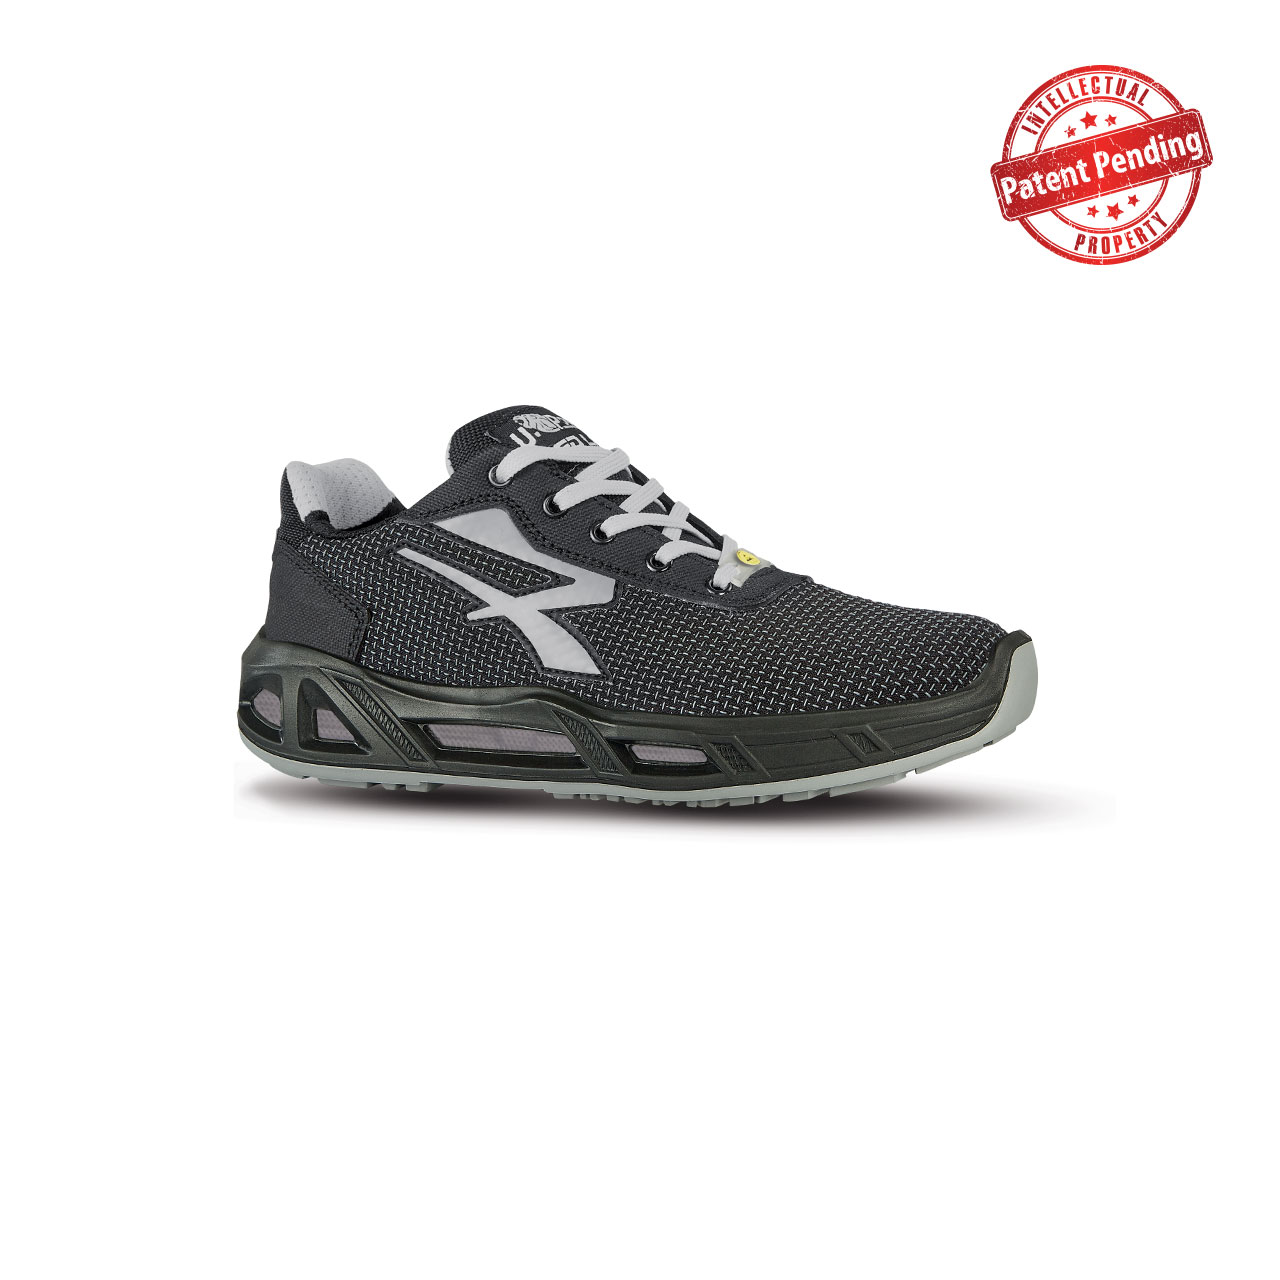 scarpa antinfortunistica upower modello raptor carpet linea redcarpet vista laterale